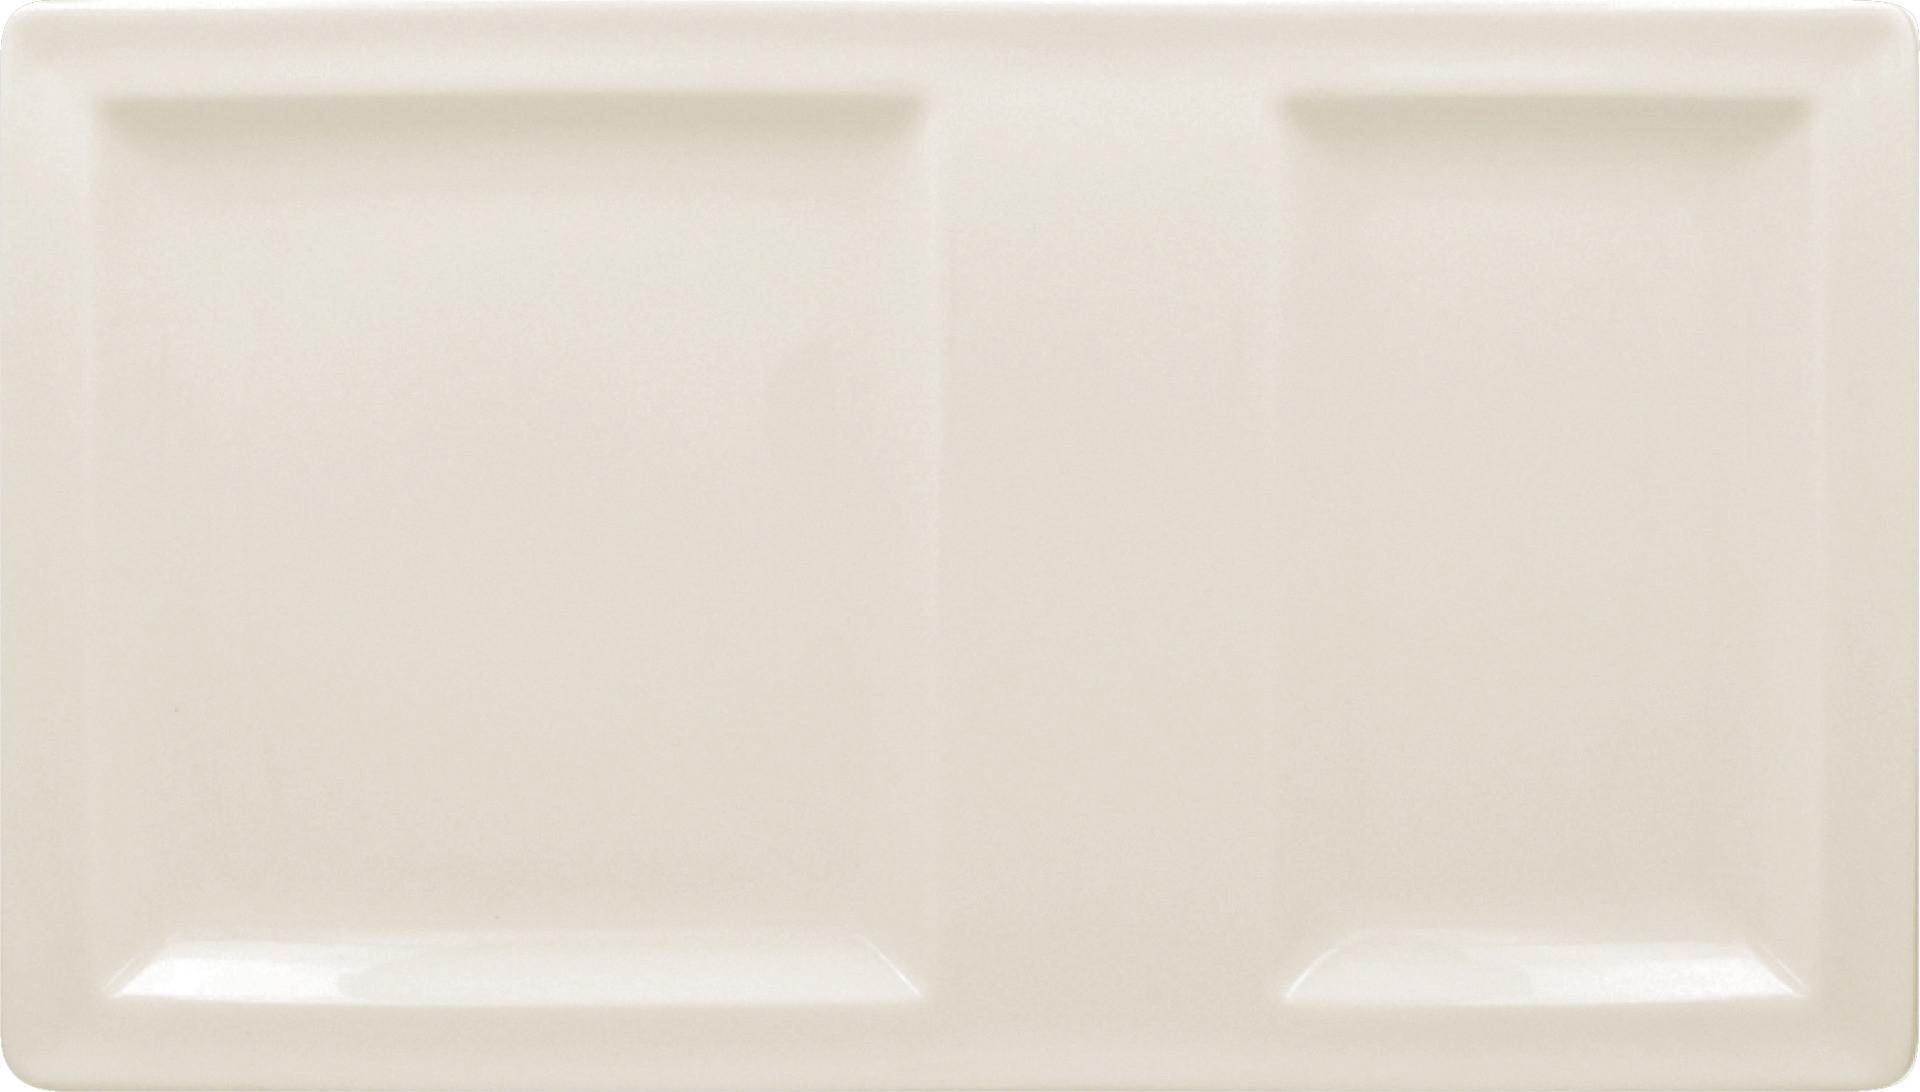 Classic Gourmet, Platte rechteckig 370 x 210 mm mit 2 Flächen creme